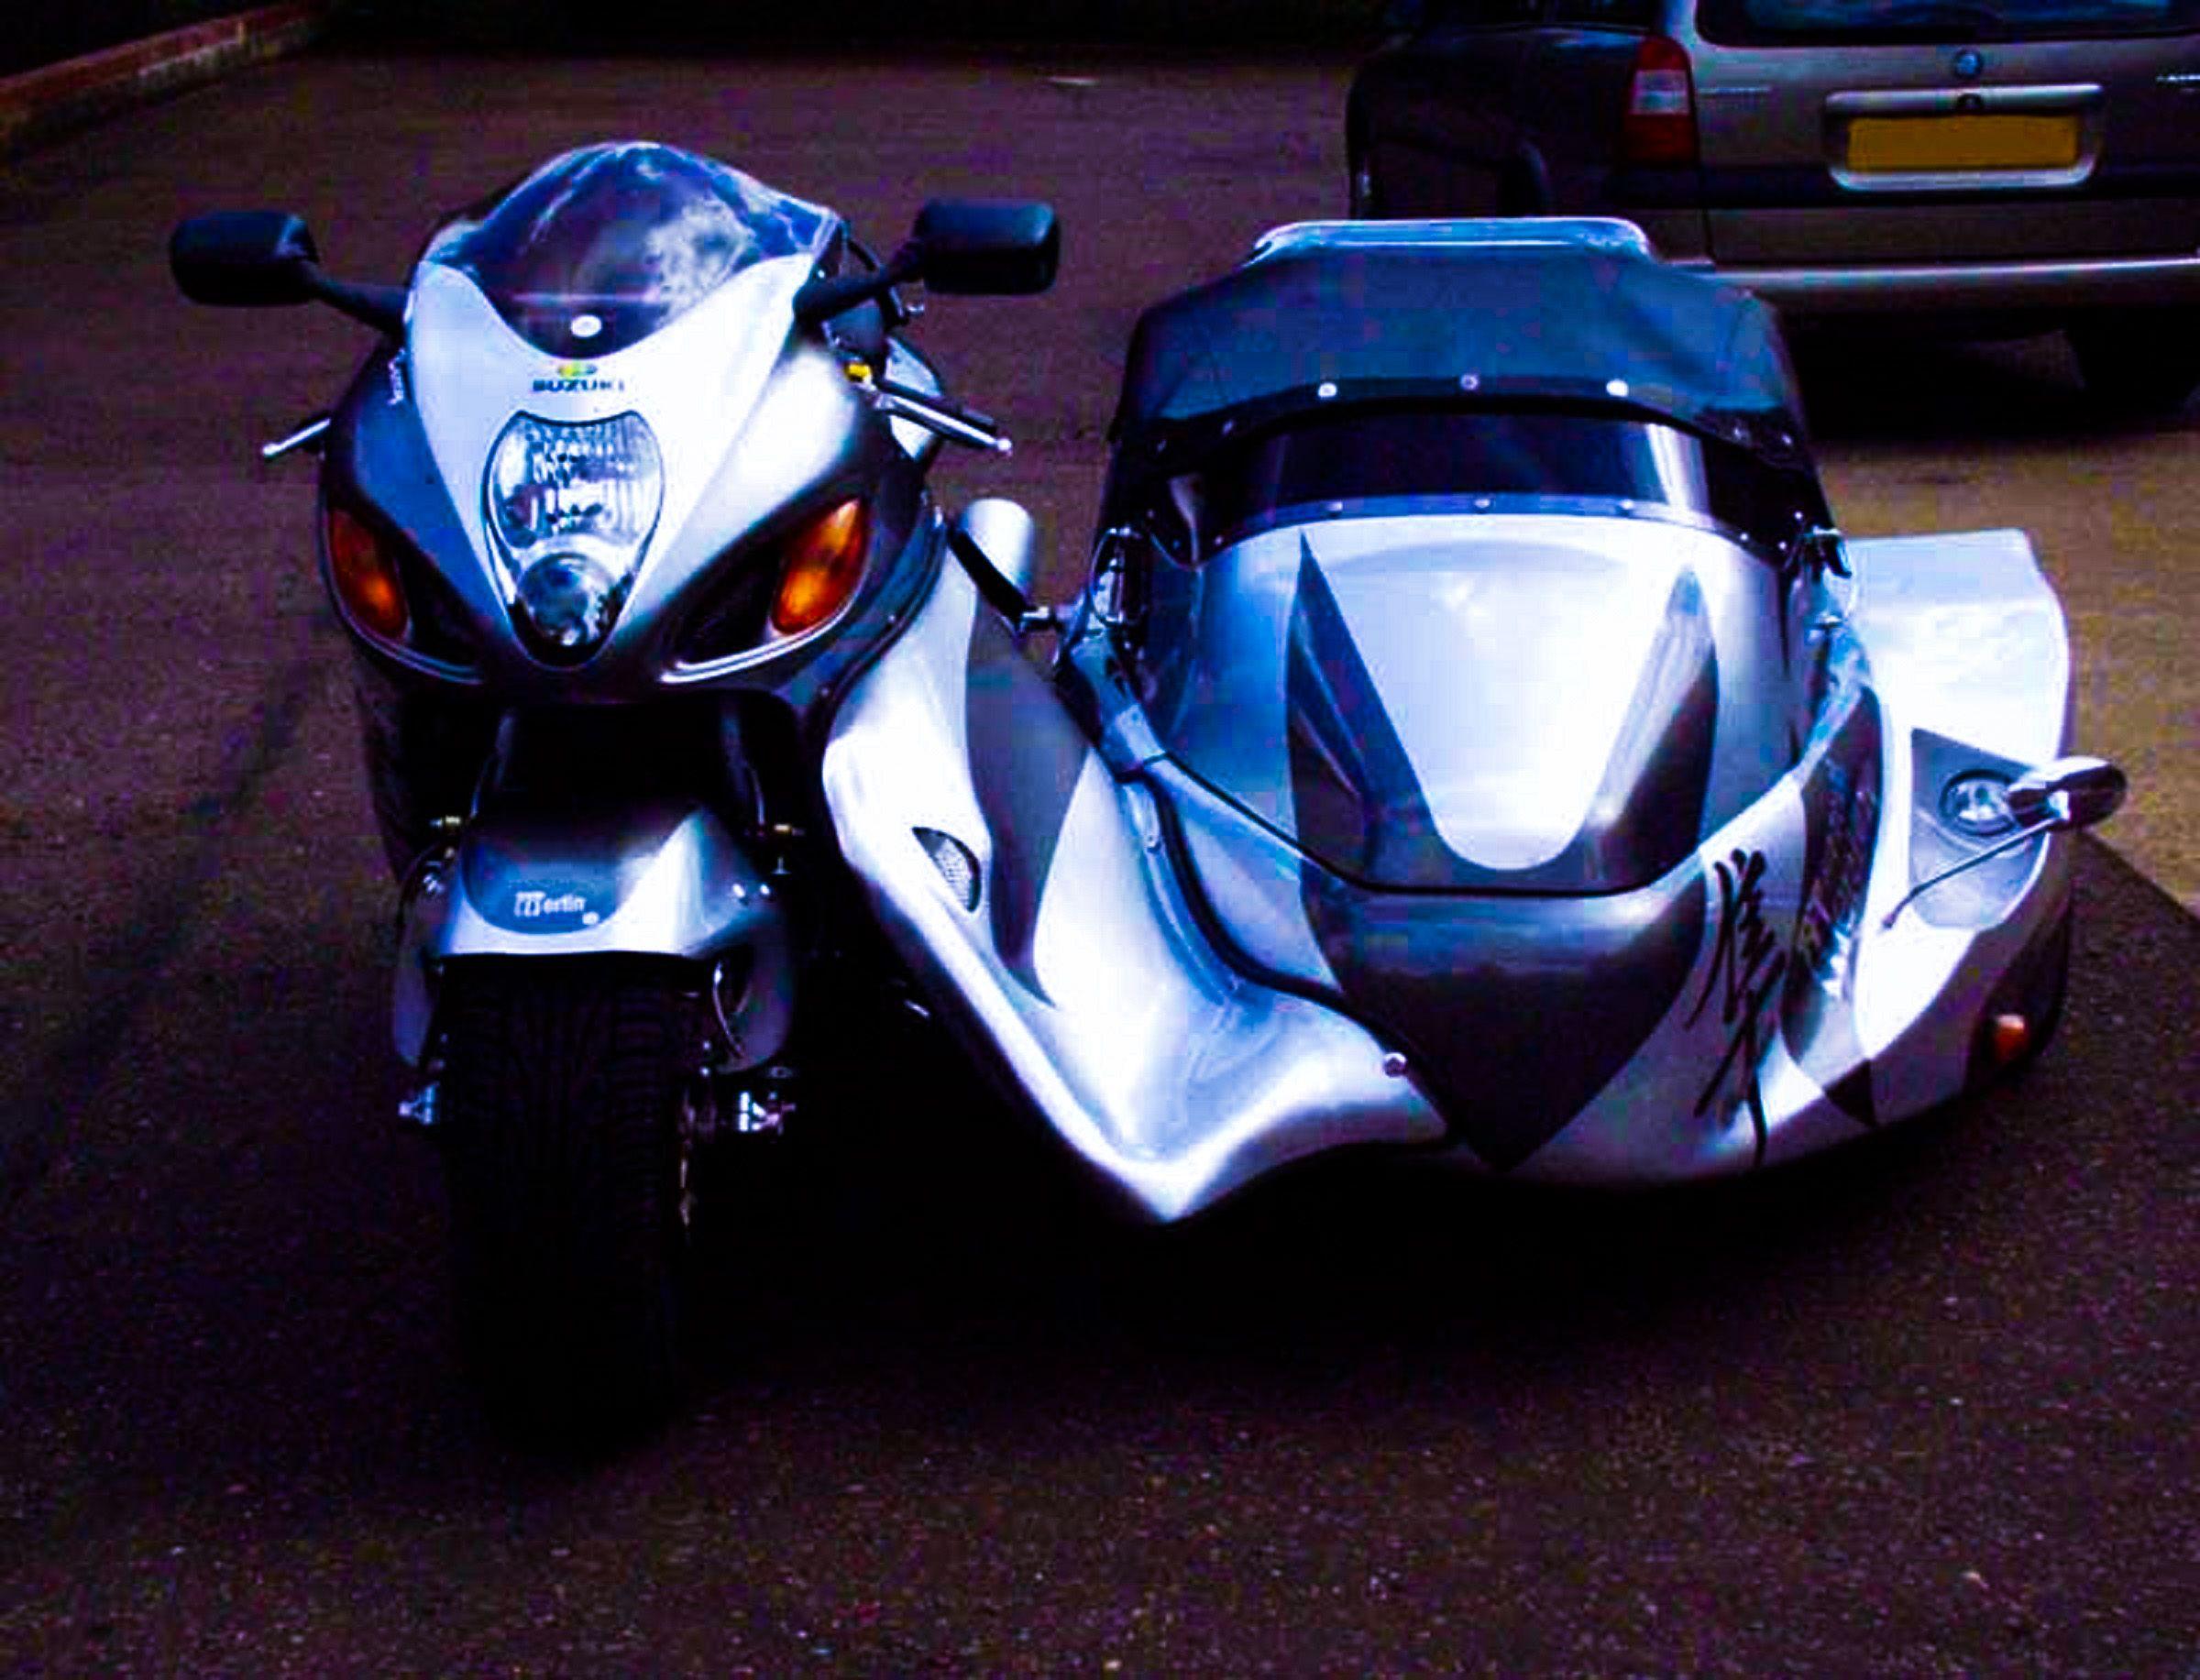 Suzuki Hayabusa + Sidecar. Http://translate.google.co.uk